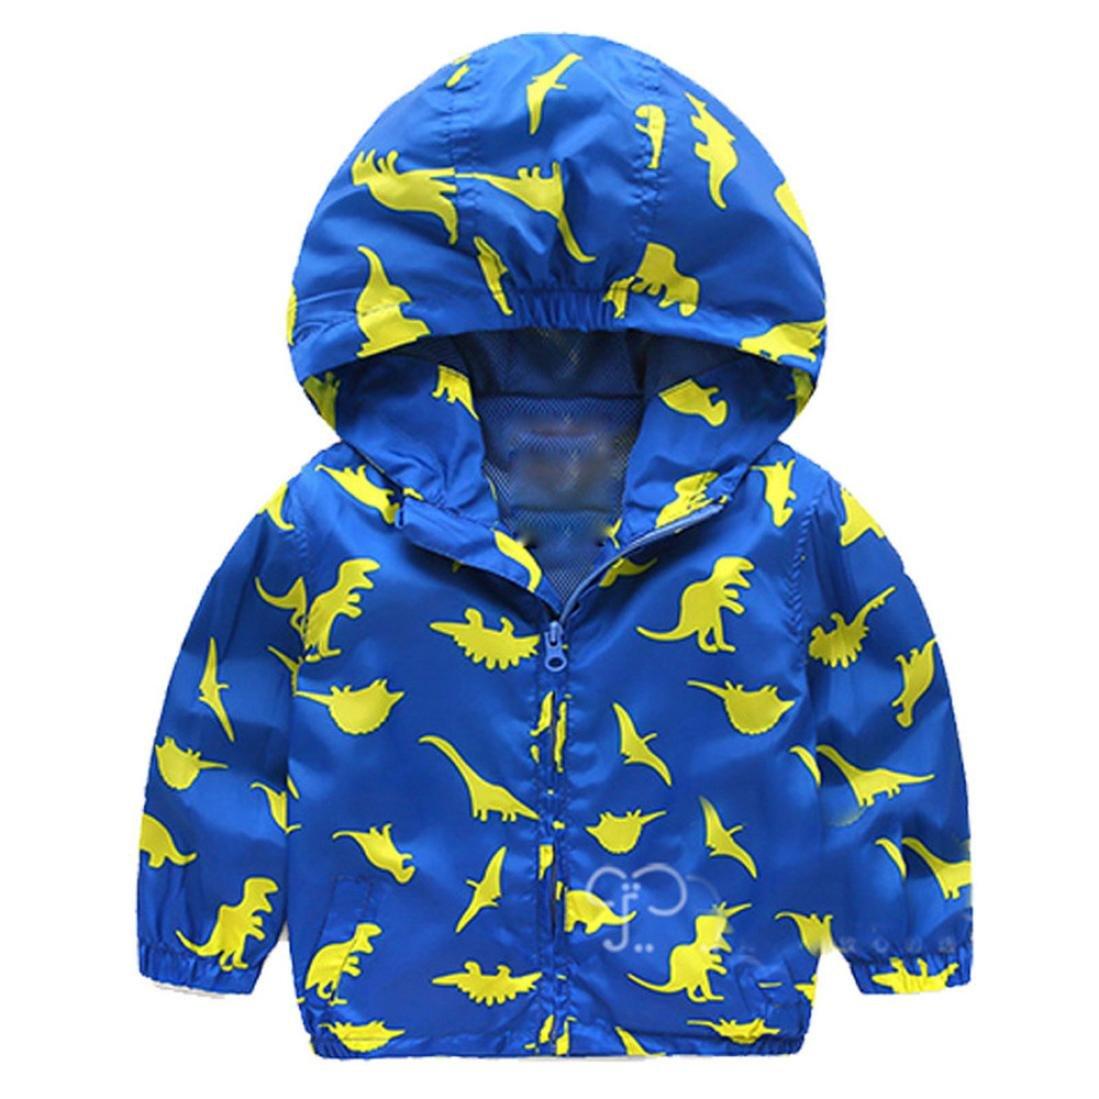 Boys Coats, SHOBDW Baby Dinosaur Geometric Hooded Zip Cloak Jacket Thick Warm Infant Clothes SHOBDW-41